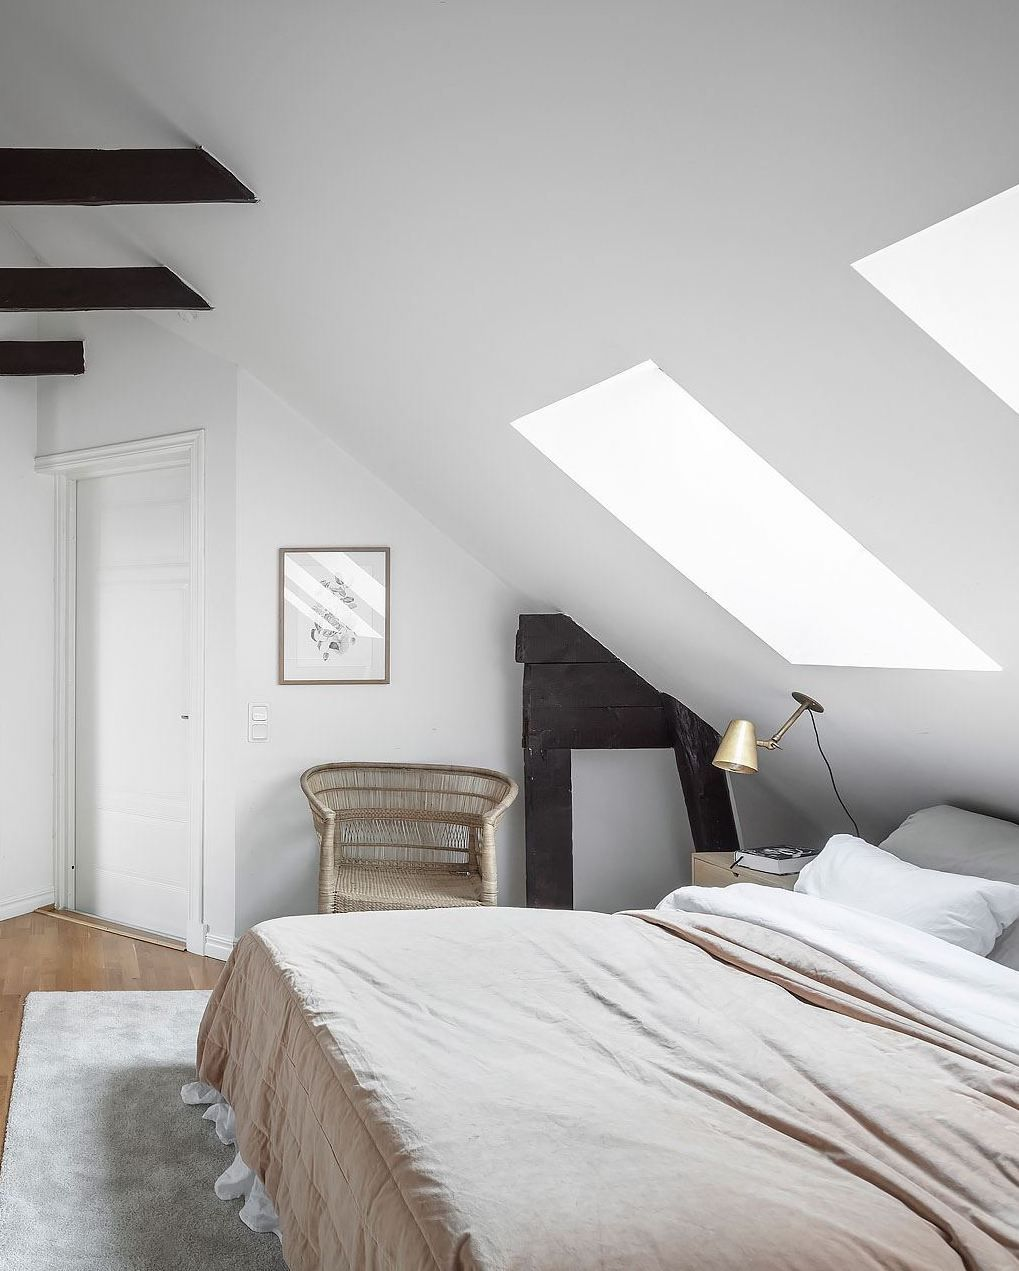 low ceiling attic bedroom ideas on cozy attic bedroom coco lapine design slanted ceiling bedroom low ceiling bedroom modern bedroom inspiration cozy attic bedroom coco lapine design